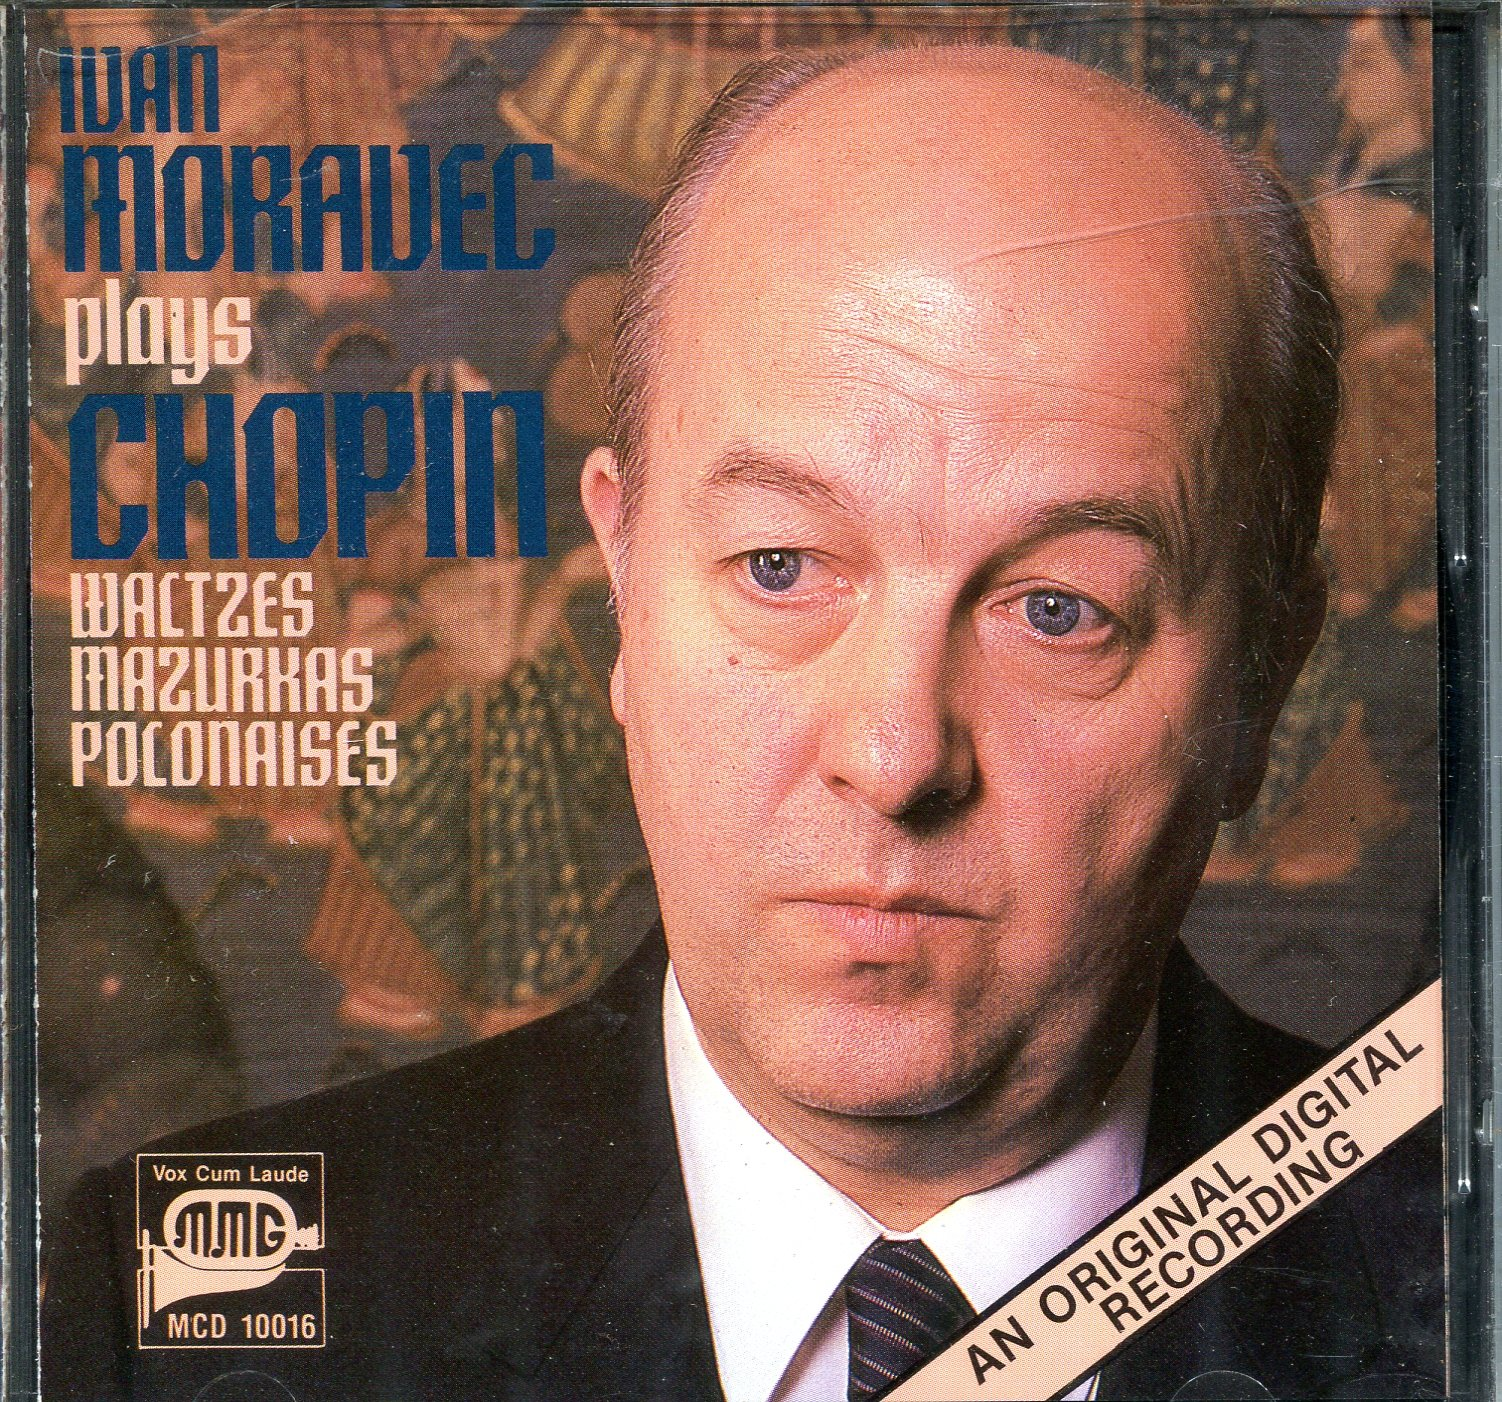 Ivan Moravec plays Chopin. Waltzes, Mazurkas, Polonaises. An Original Digital Recording by Vox Cum Laude MCD